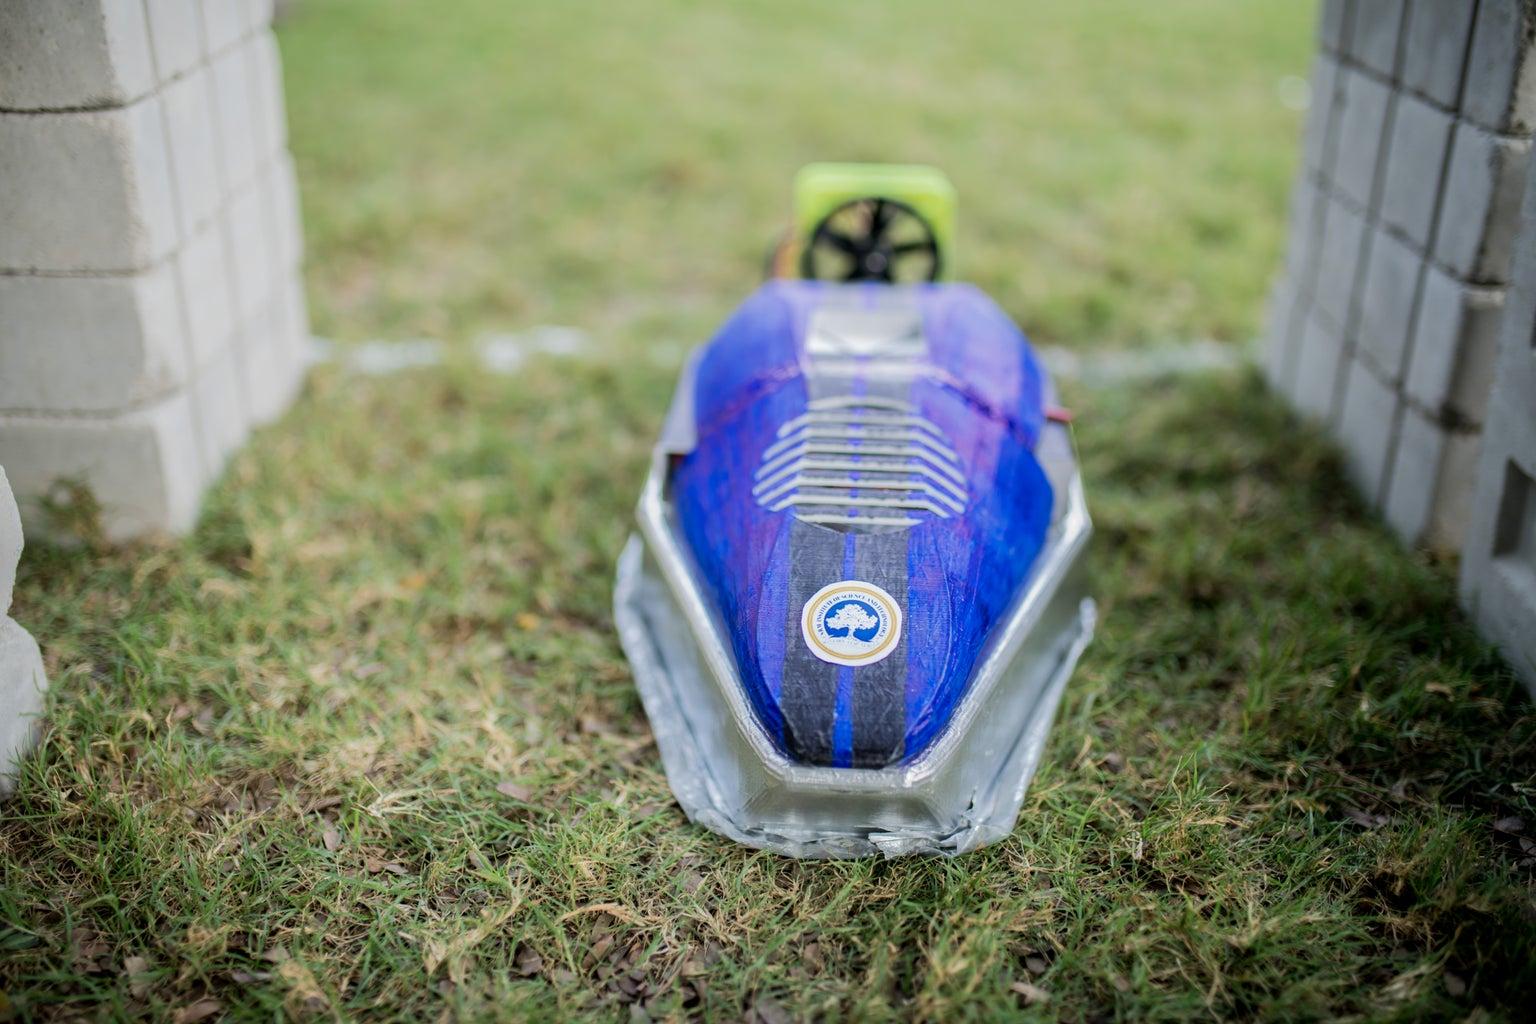 Hovercraft 1.0